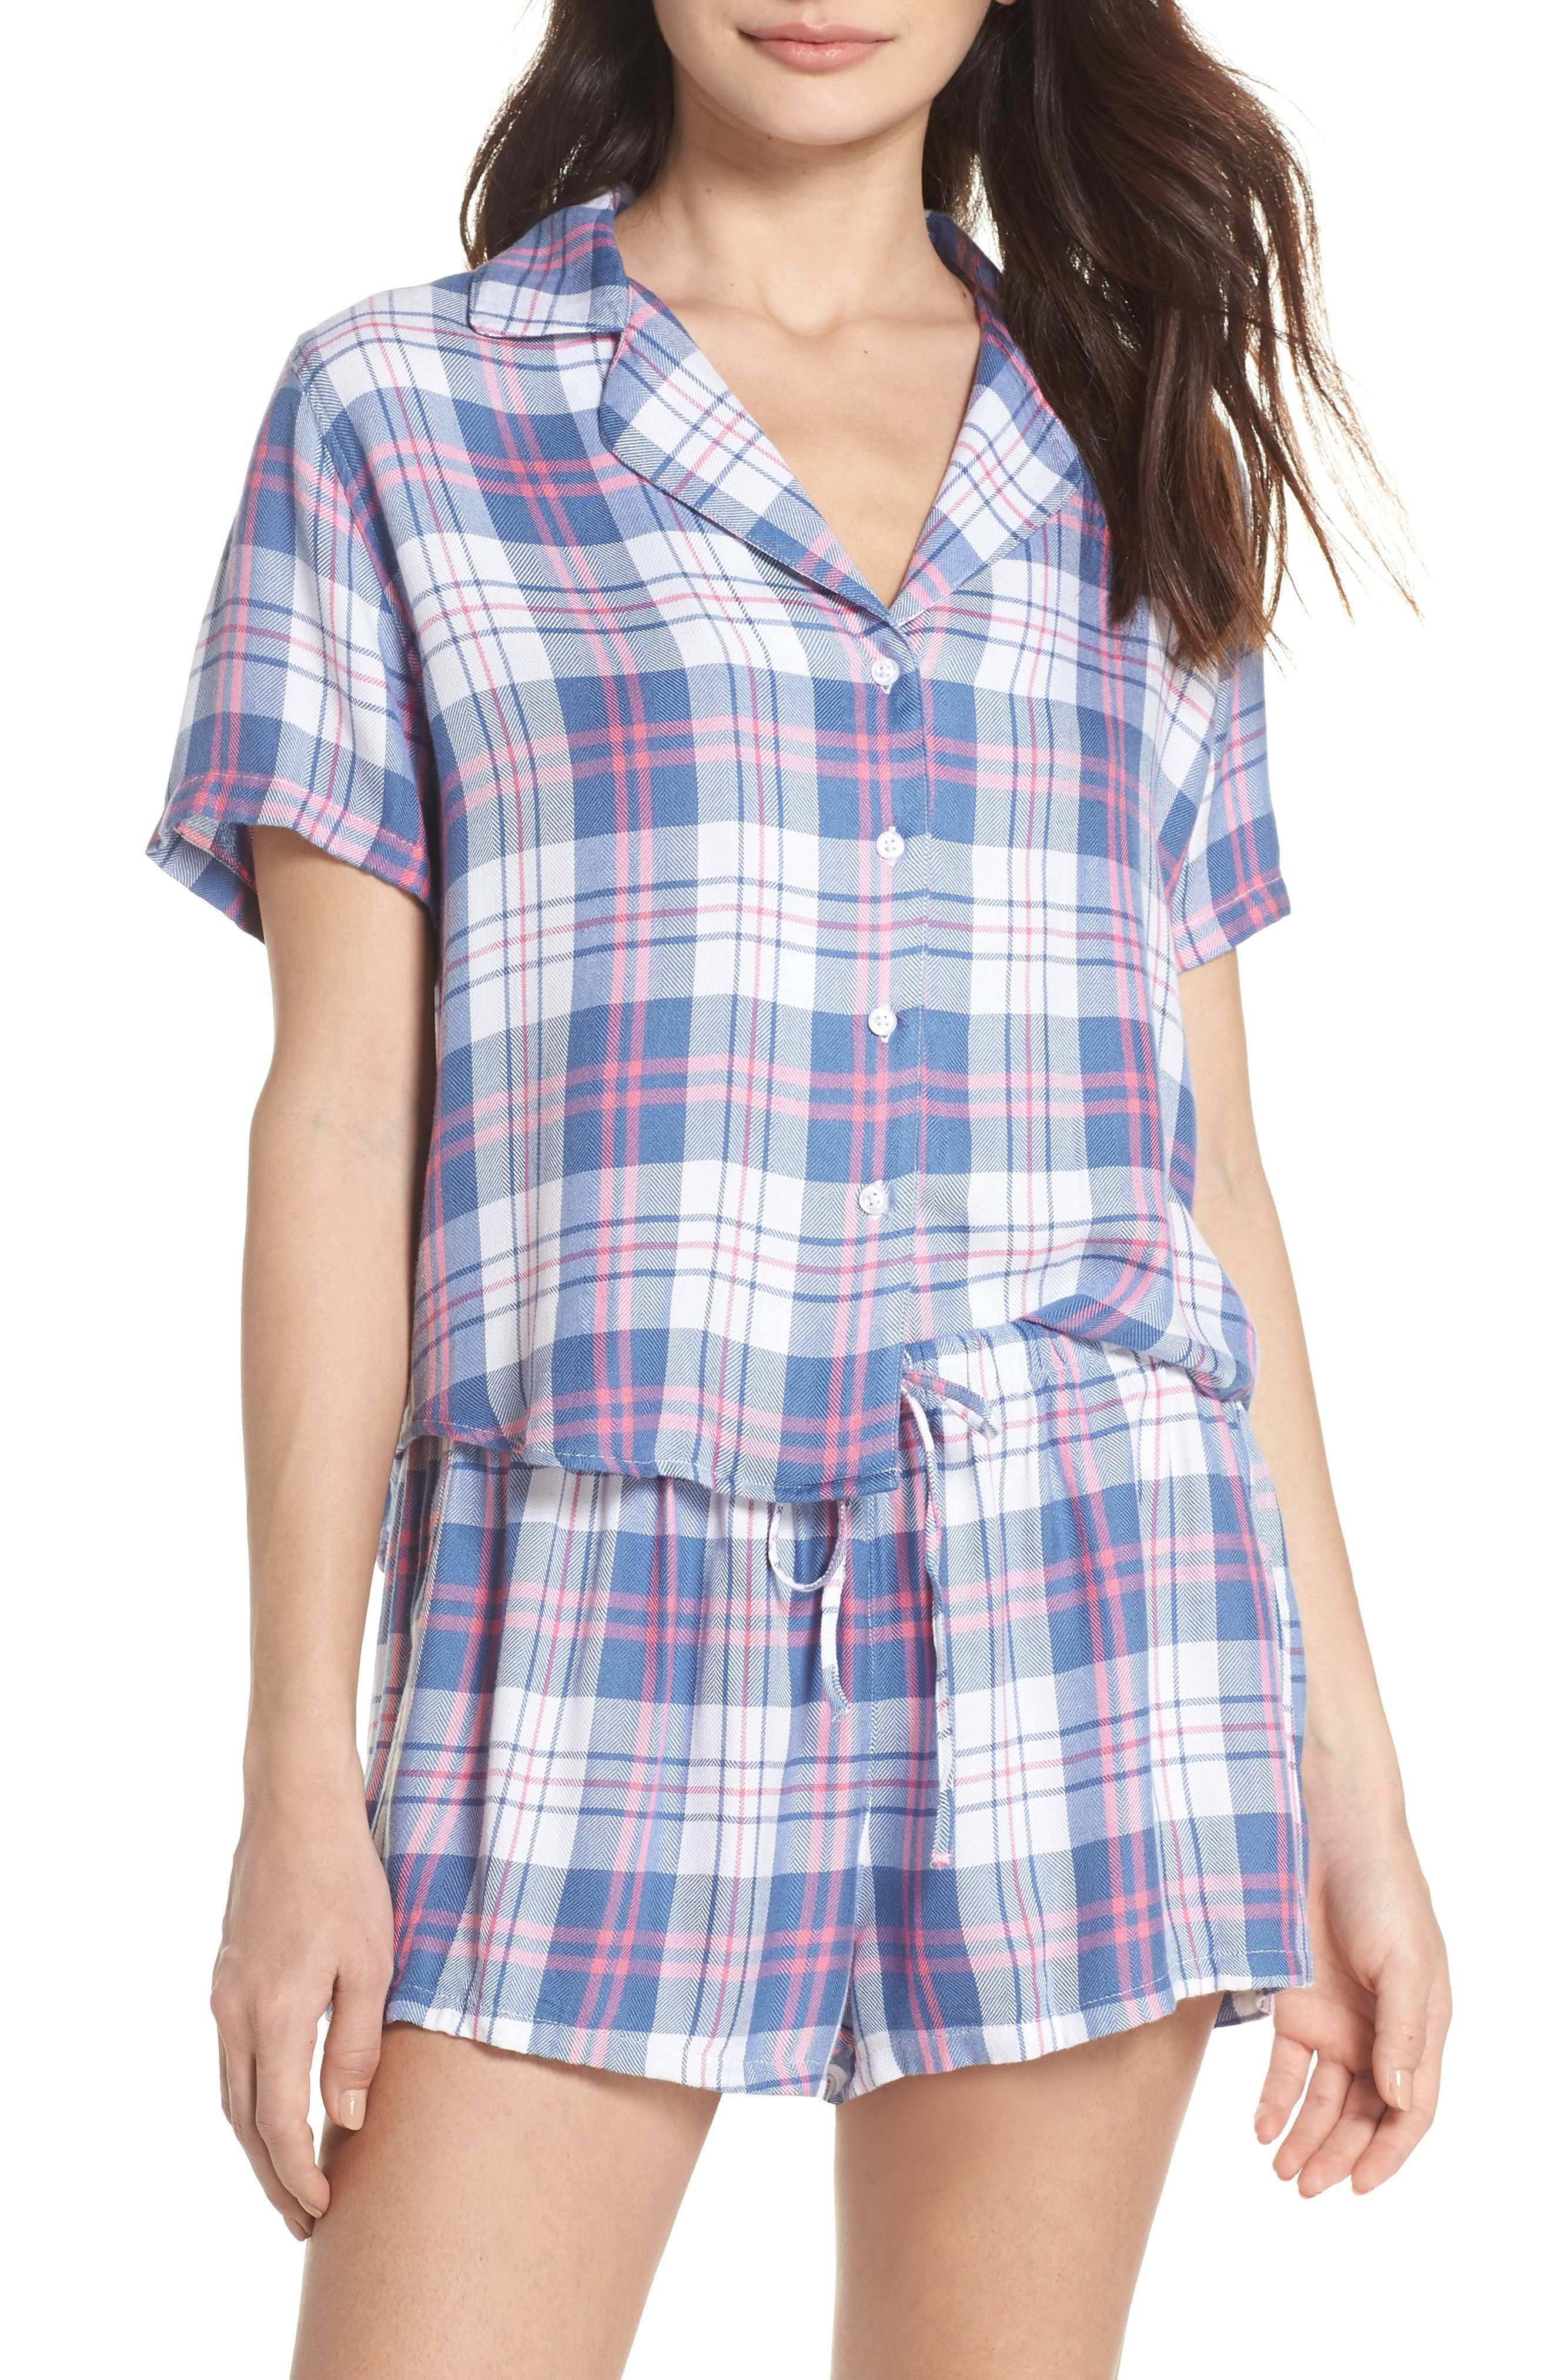 Image of Rails Plaid Short Pajamas